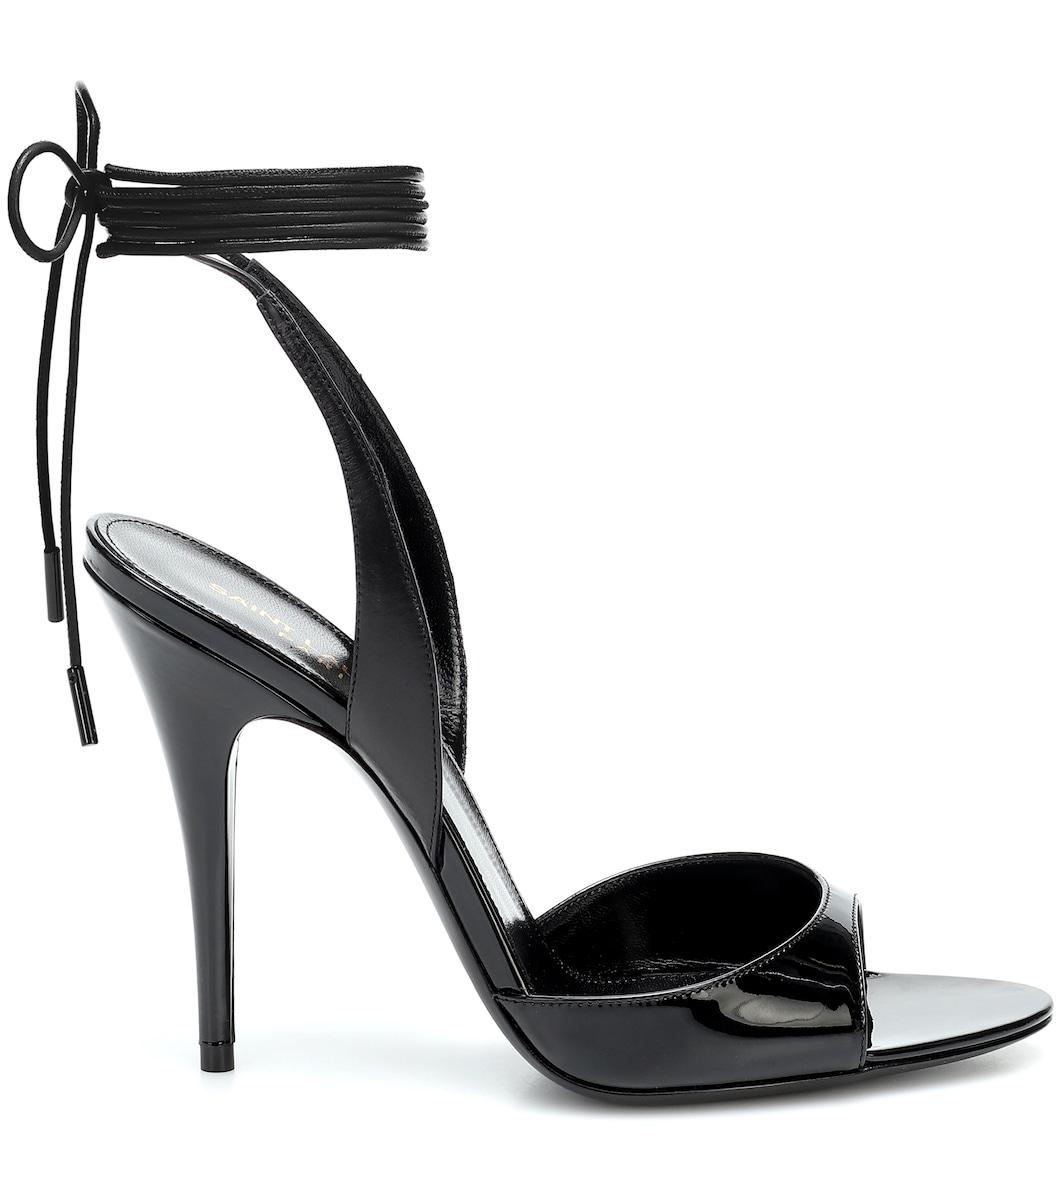 Anouk 110 patent leather sandals